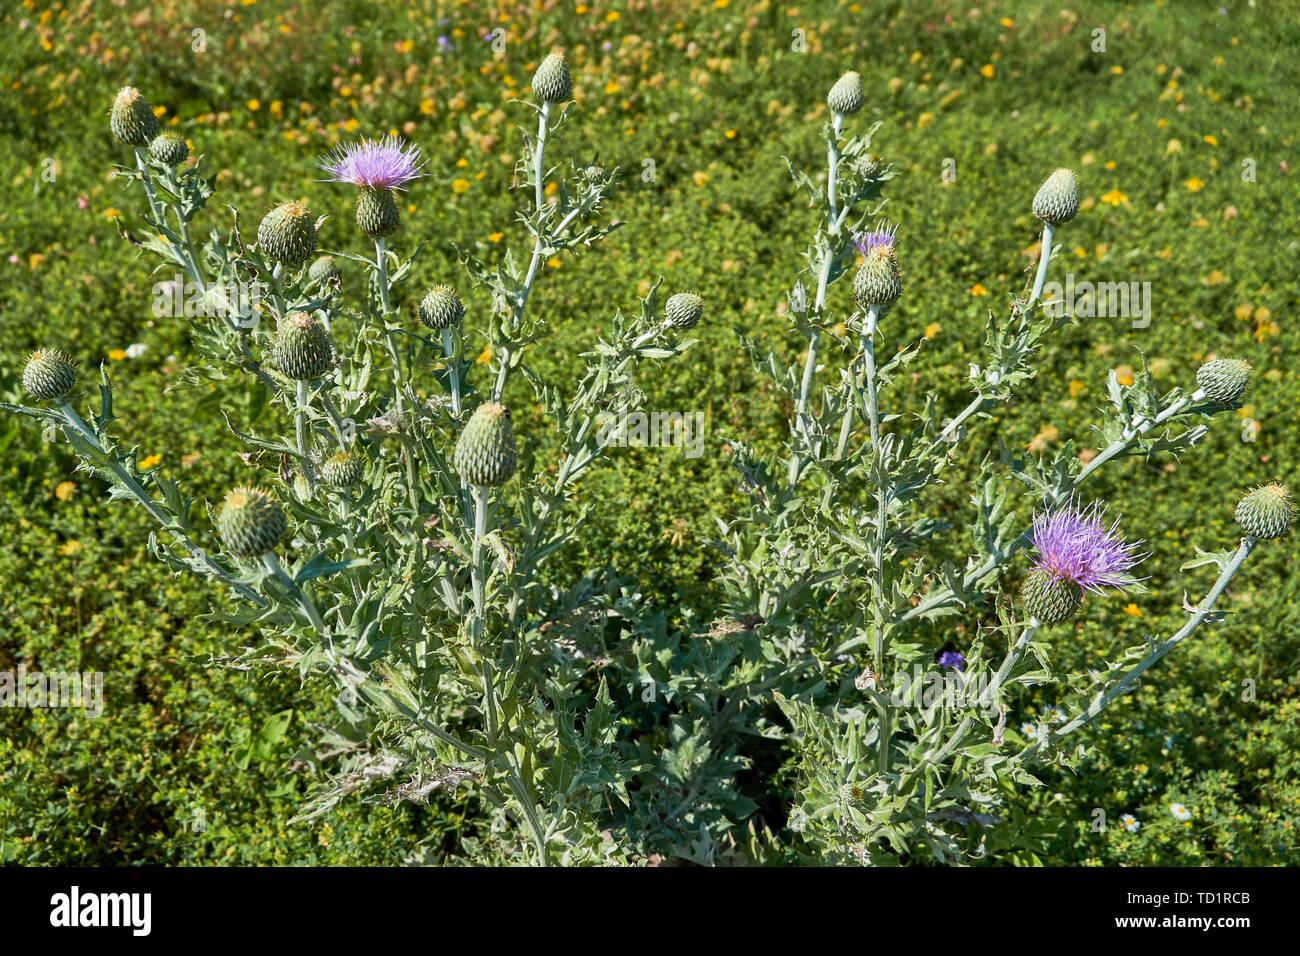 Texas Thistle Plant with blooms (Cirsium texanum) Stock Photo